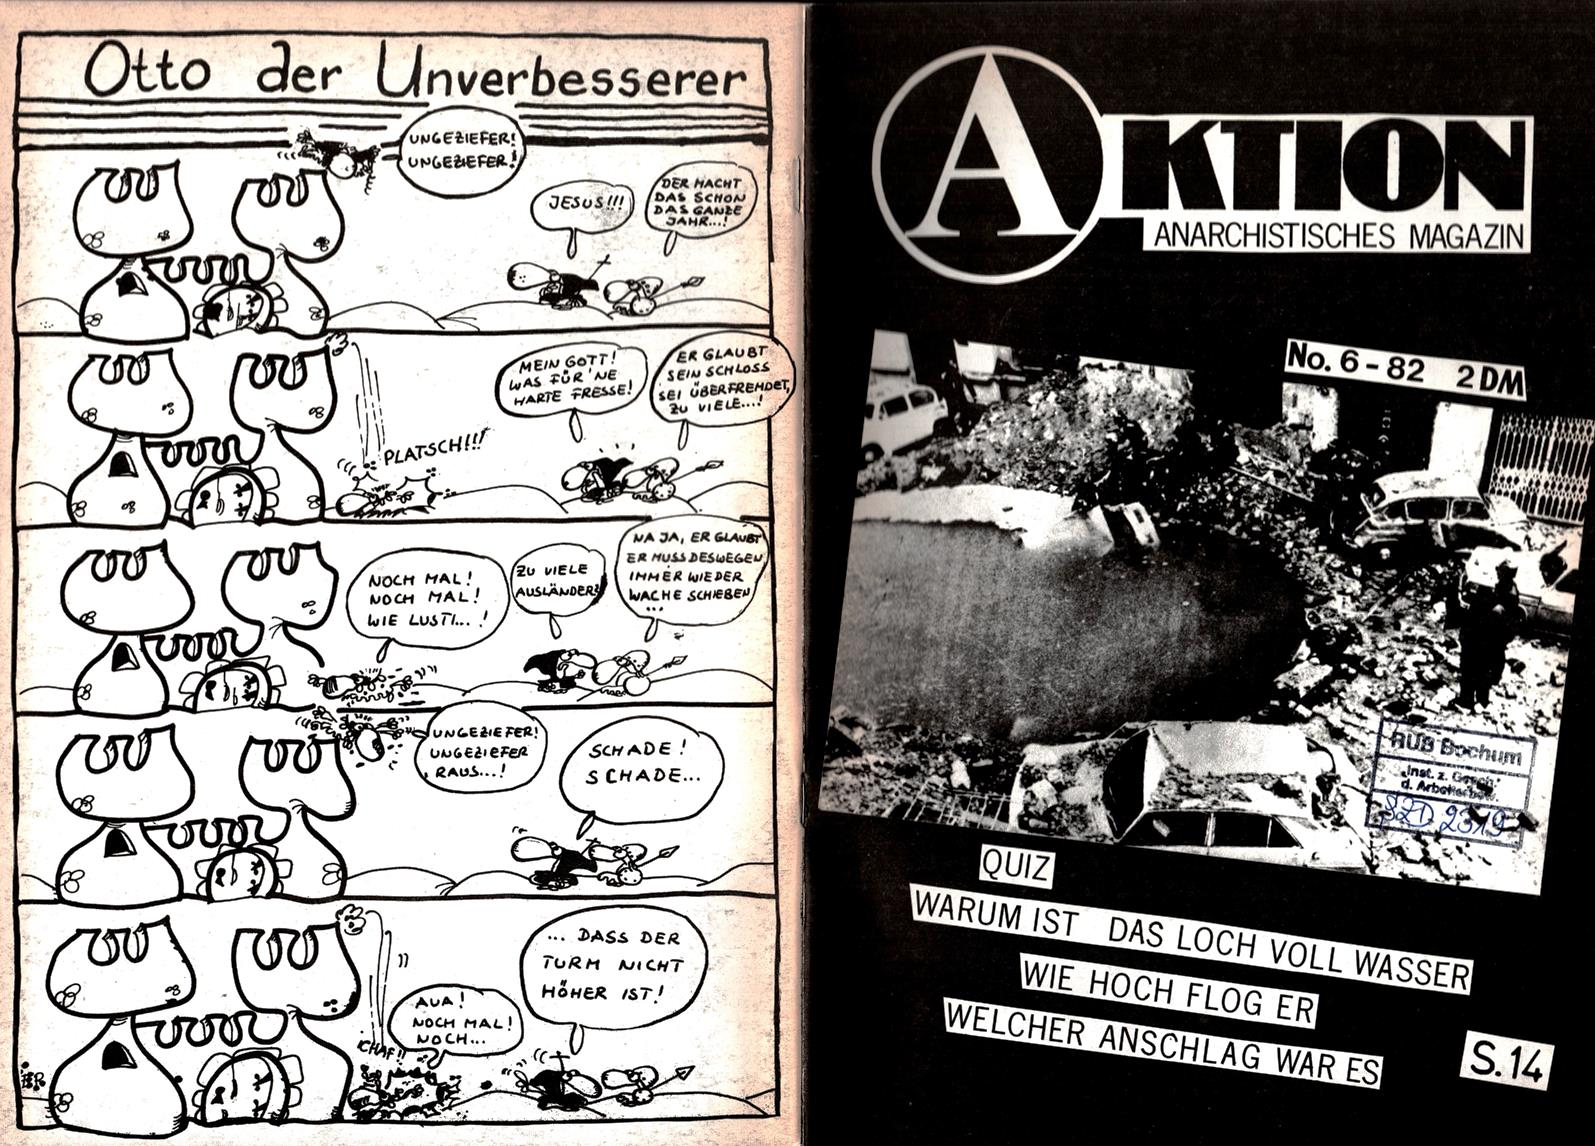 Frankfurt_Aktion_19821100_006_001